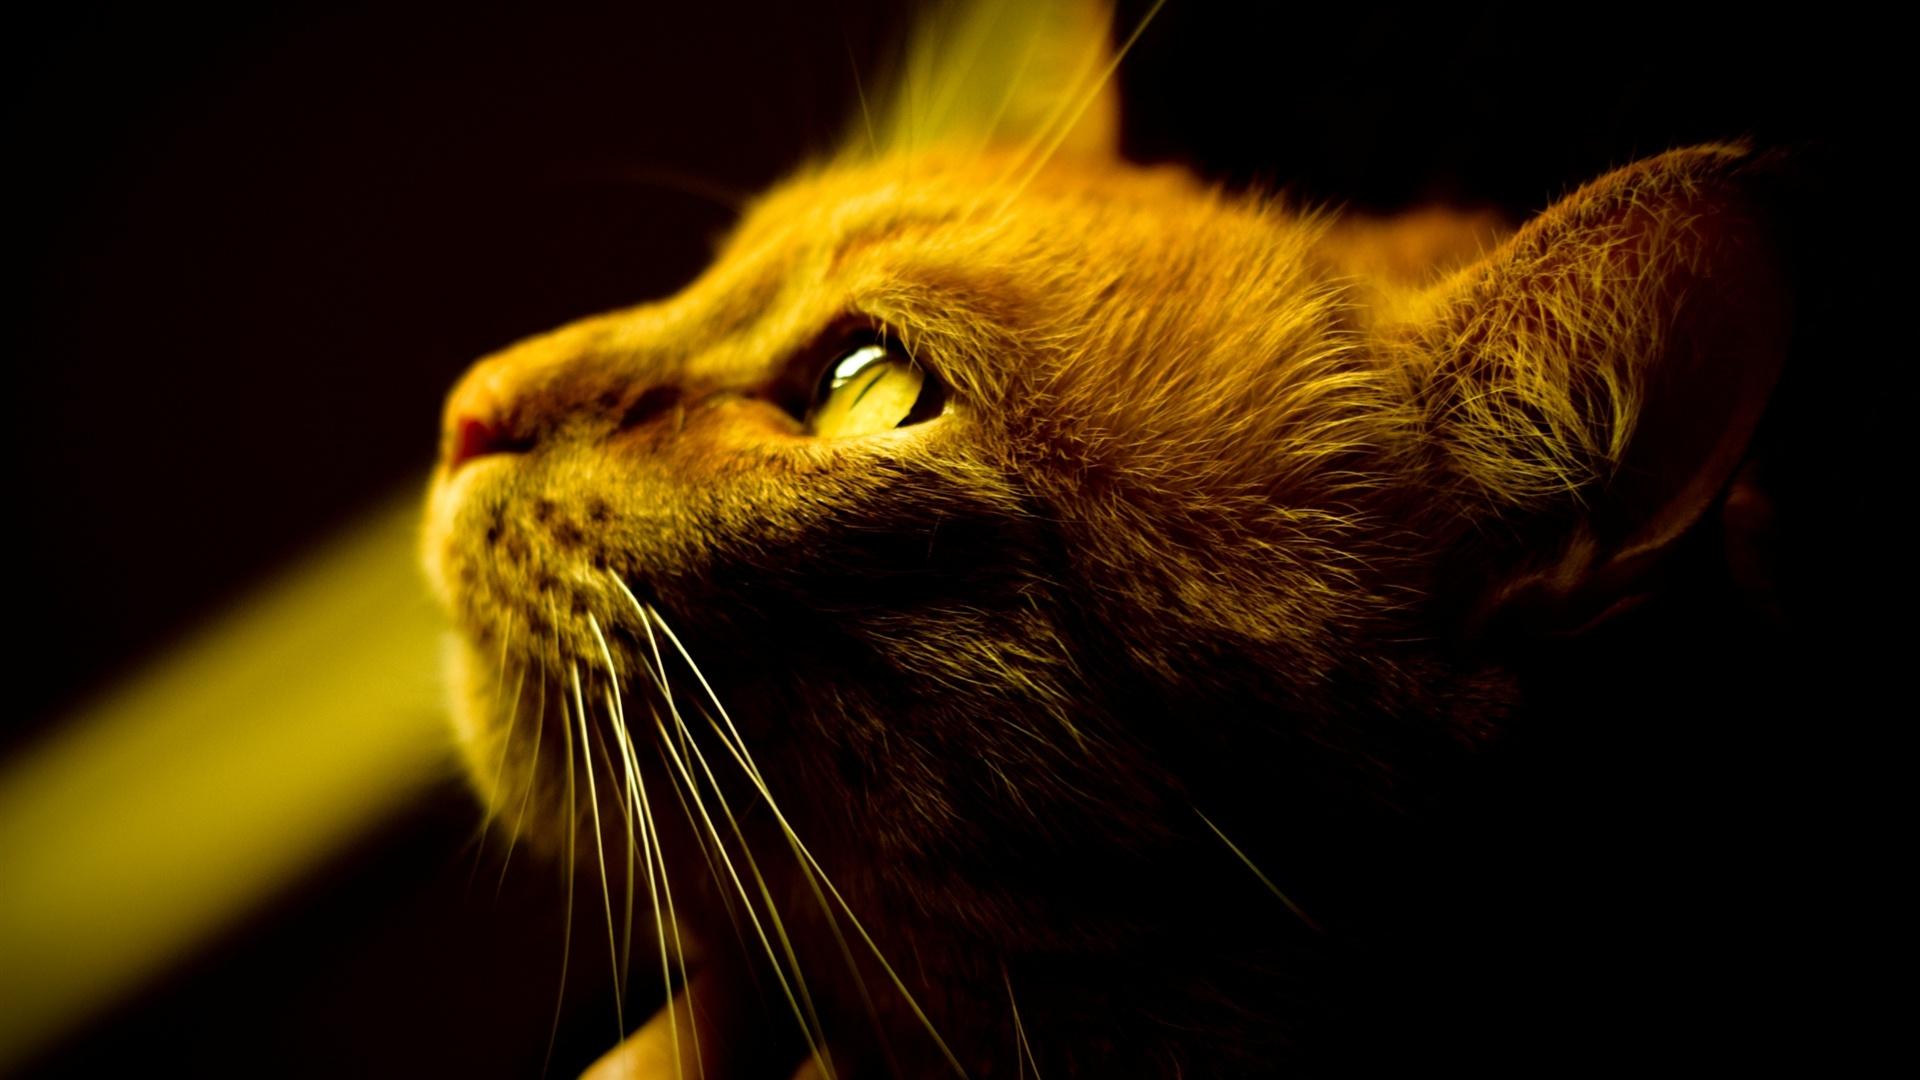 16 Luxury Pubg Wallpaper Iphone 6: 壁紙 茶色の猫の目、顔のクローズアップ、黄色目 2560x1600 HD